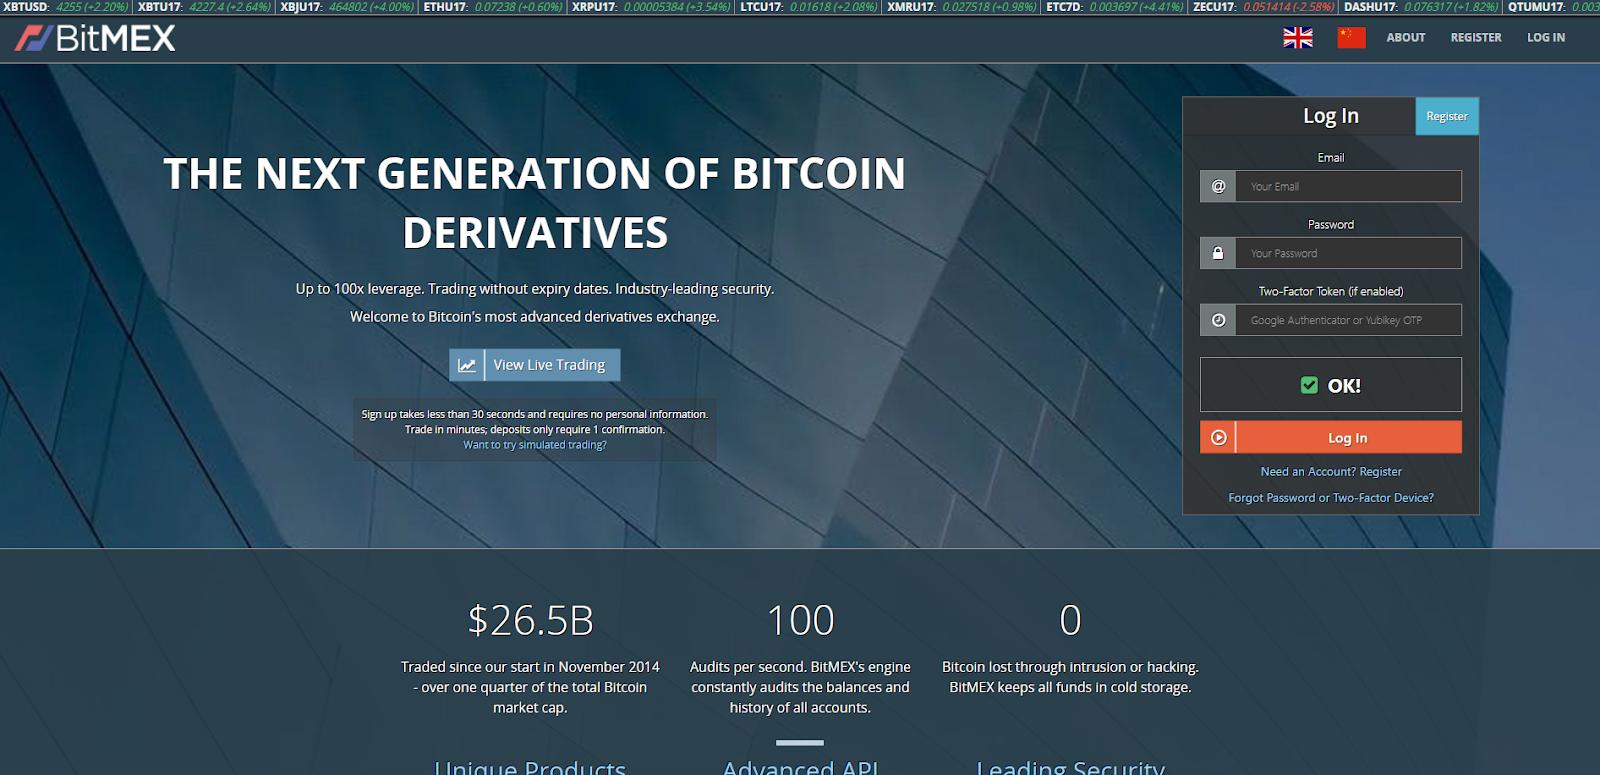 Bitmex Review | How Does Bitmex Work - Comprehensive Tutorial